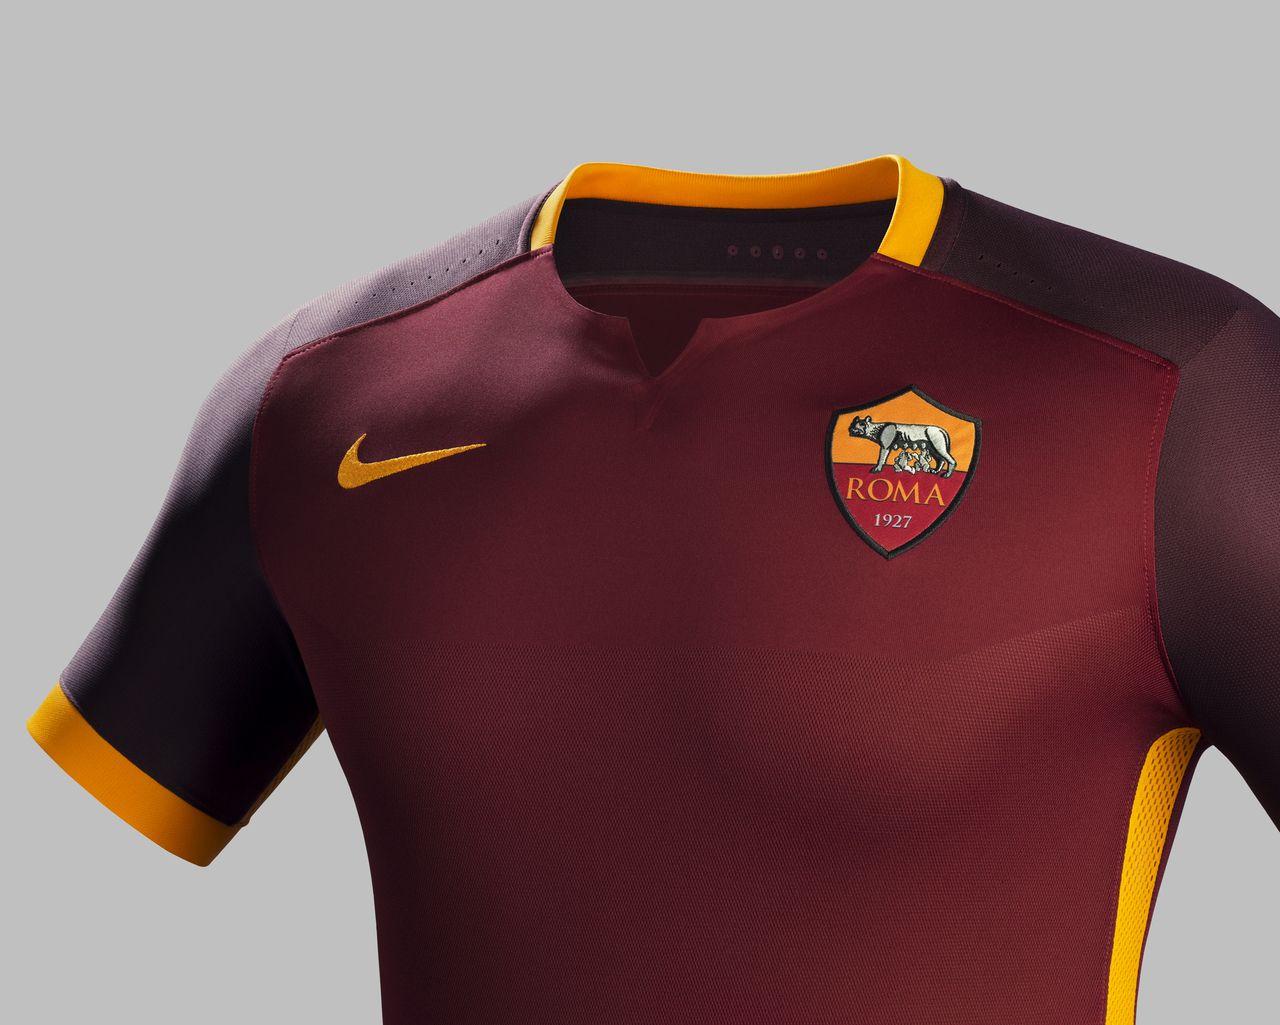 AS Roma 15/16 Nike Home Football Shirt | 15/16 Kits | Football shirt blog |  Camisas de futebol, Futebol, Camisa